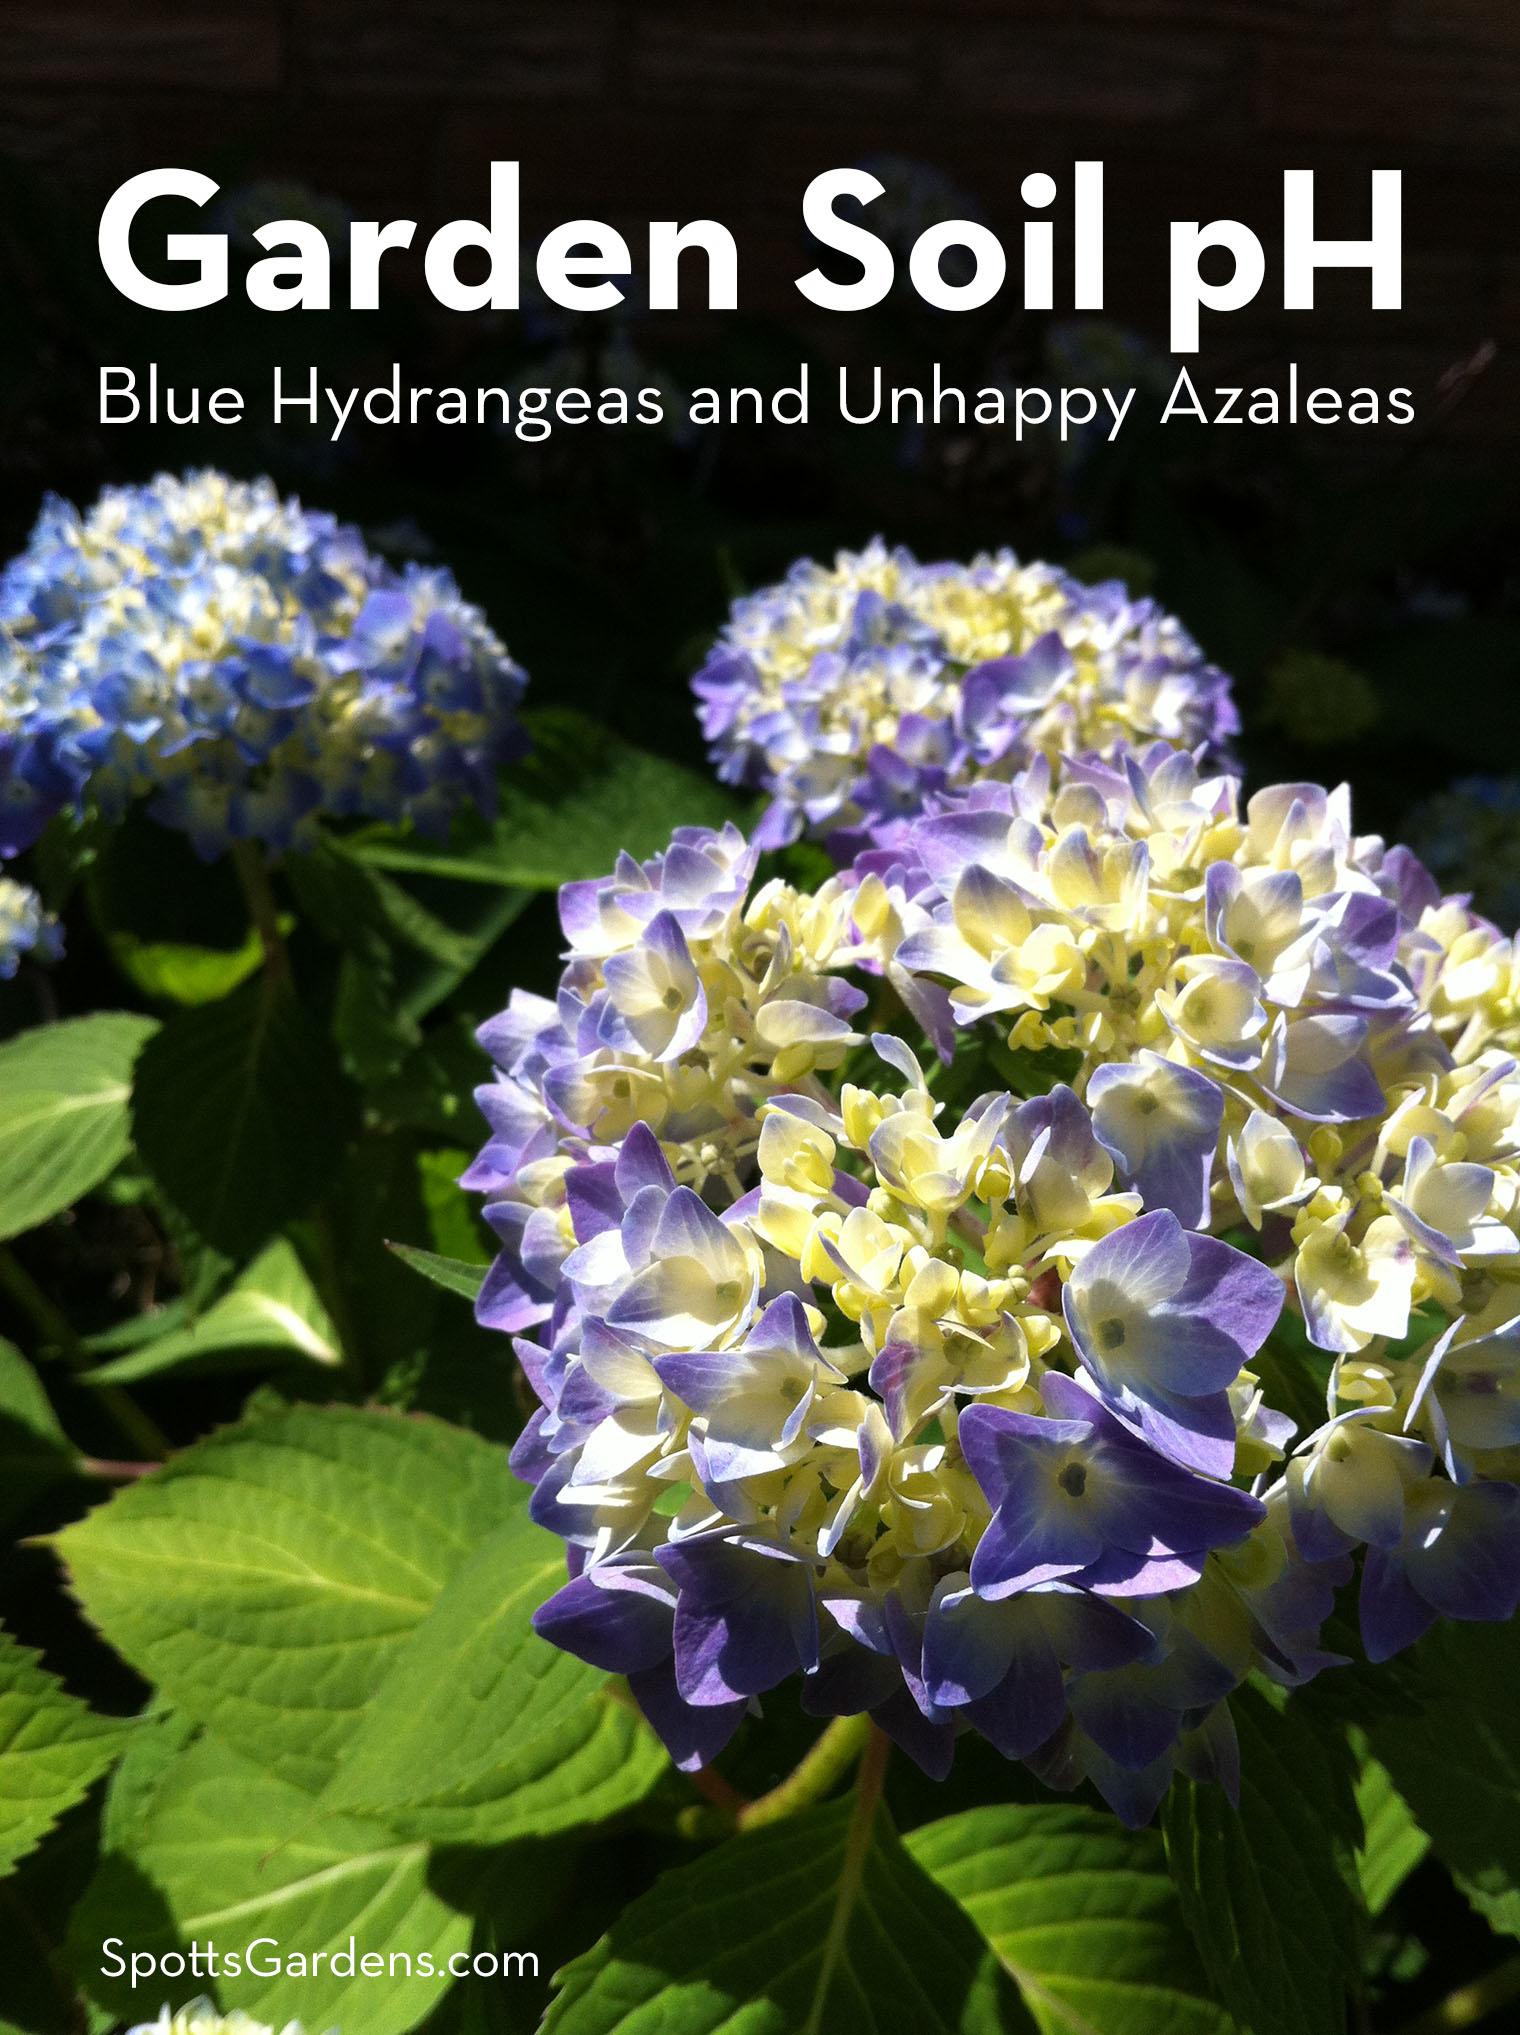 Garden Soil pH: Blue Hydrangeas and Unhappy Azaleas